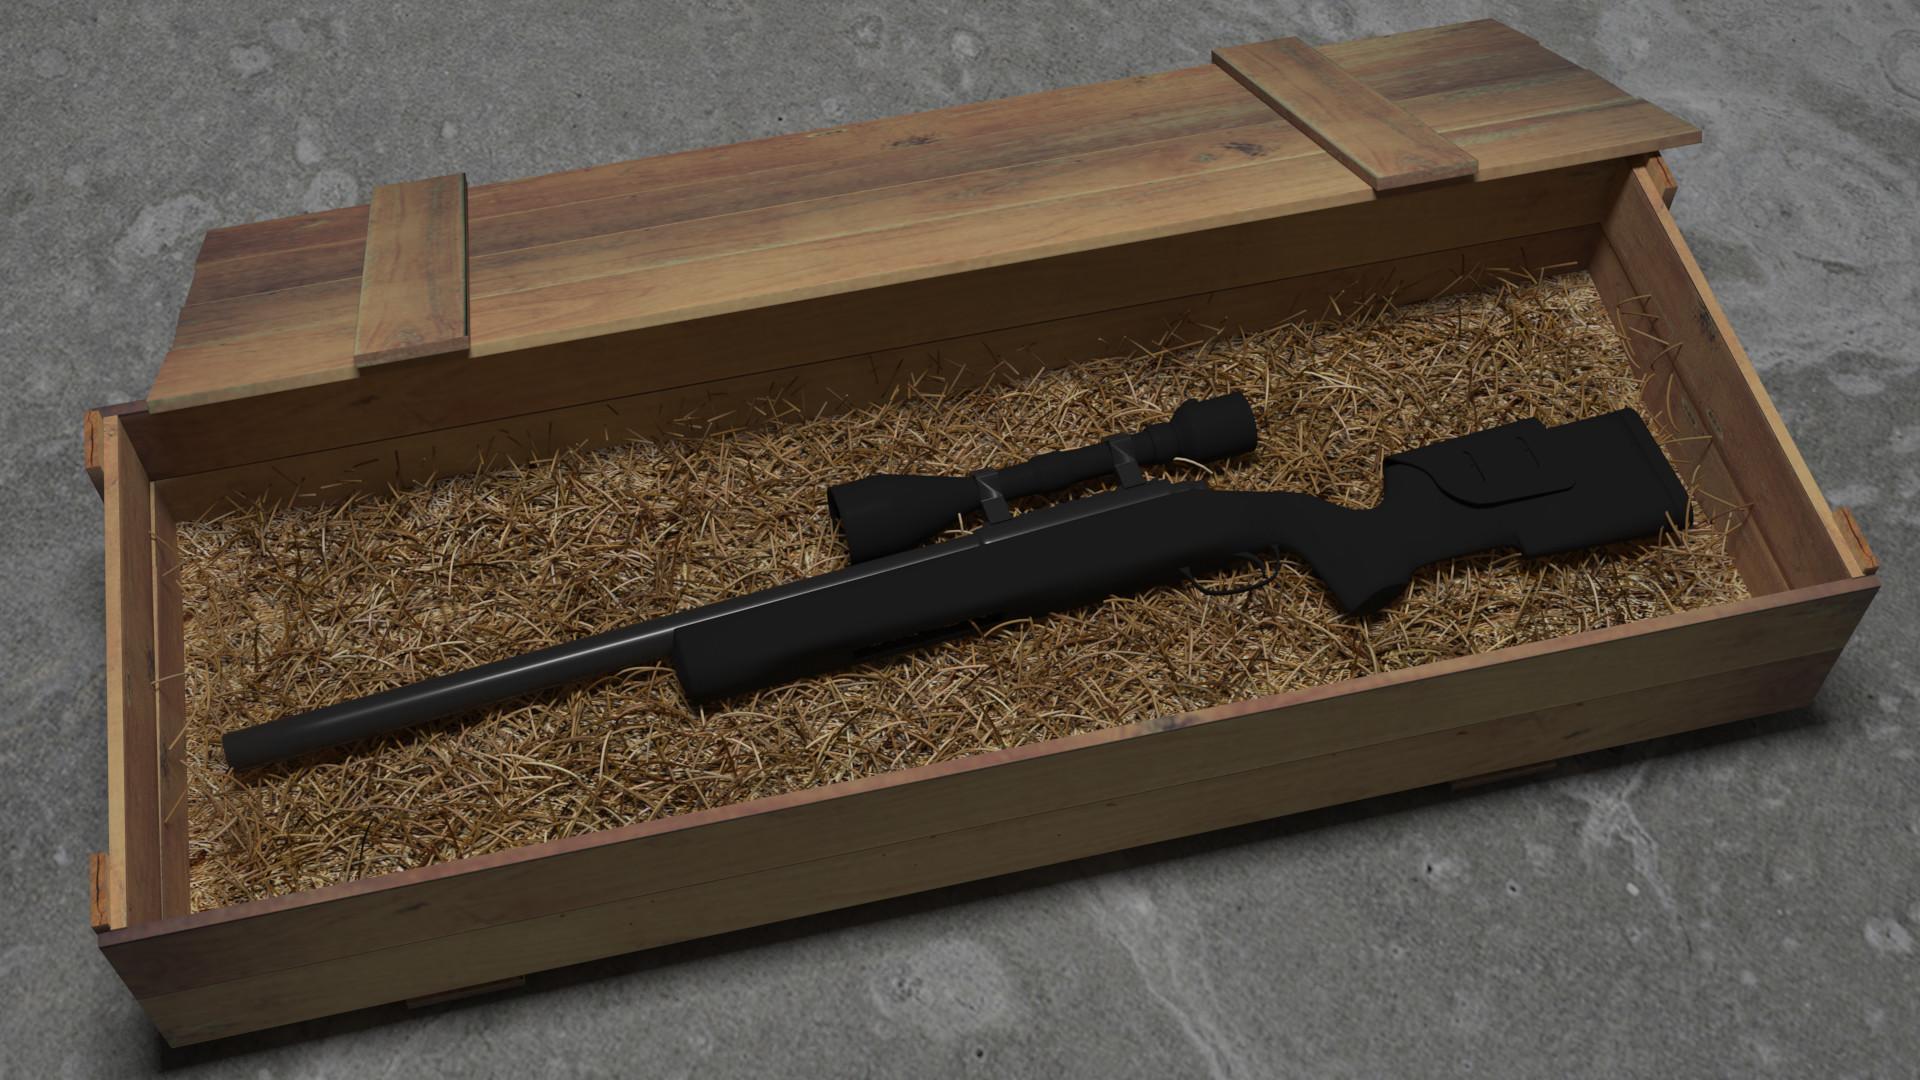 Artstation Fn Police Rifle In Ww2 Military Crate Rasmus Jensen